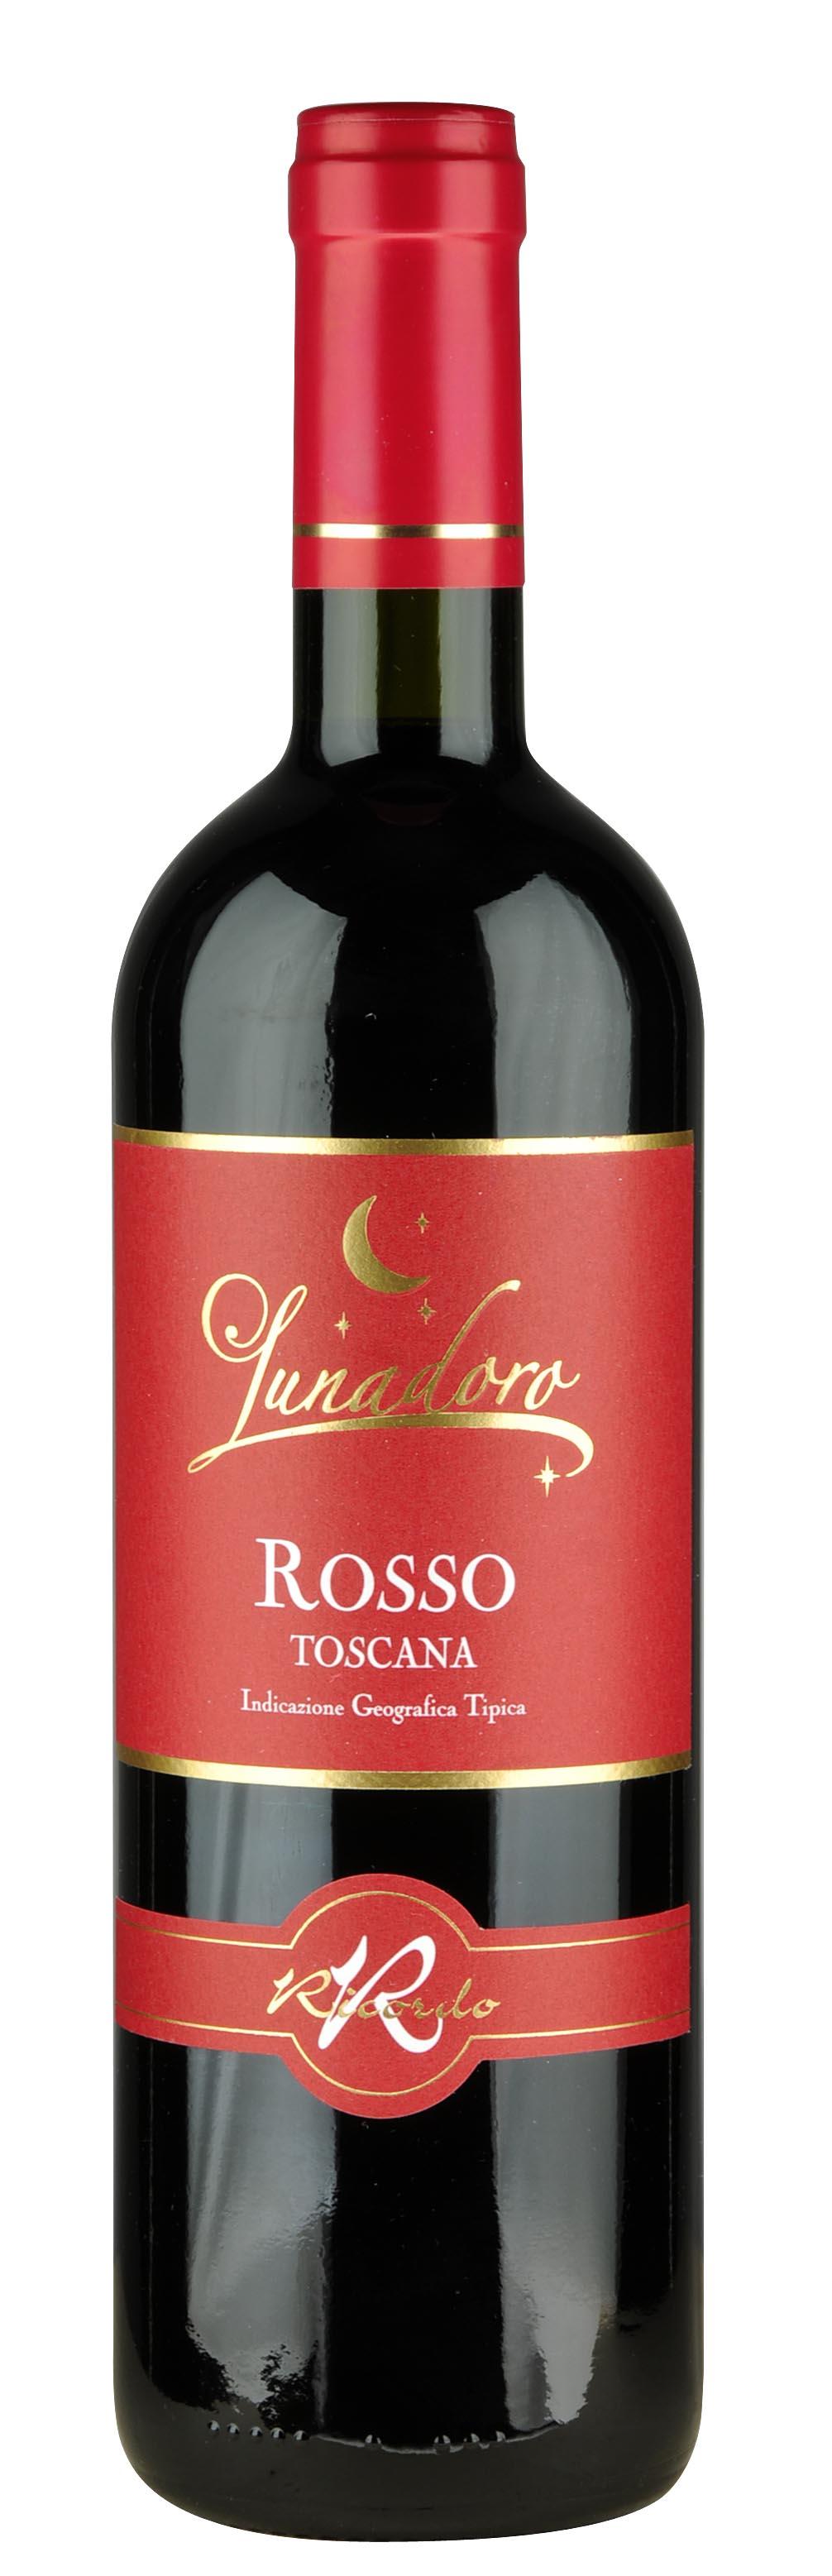 Lunadoro Rosso Ricordo Pauline&Olivier